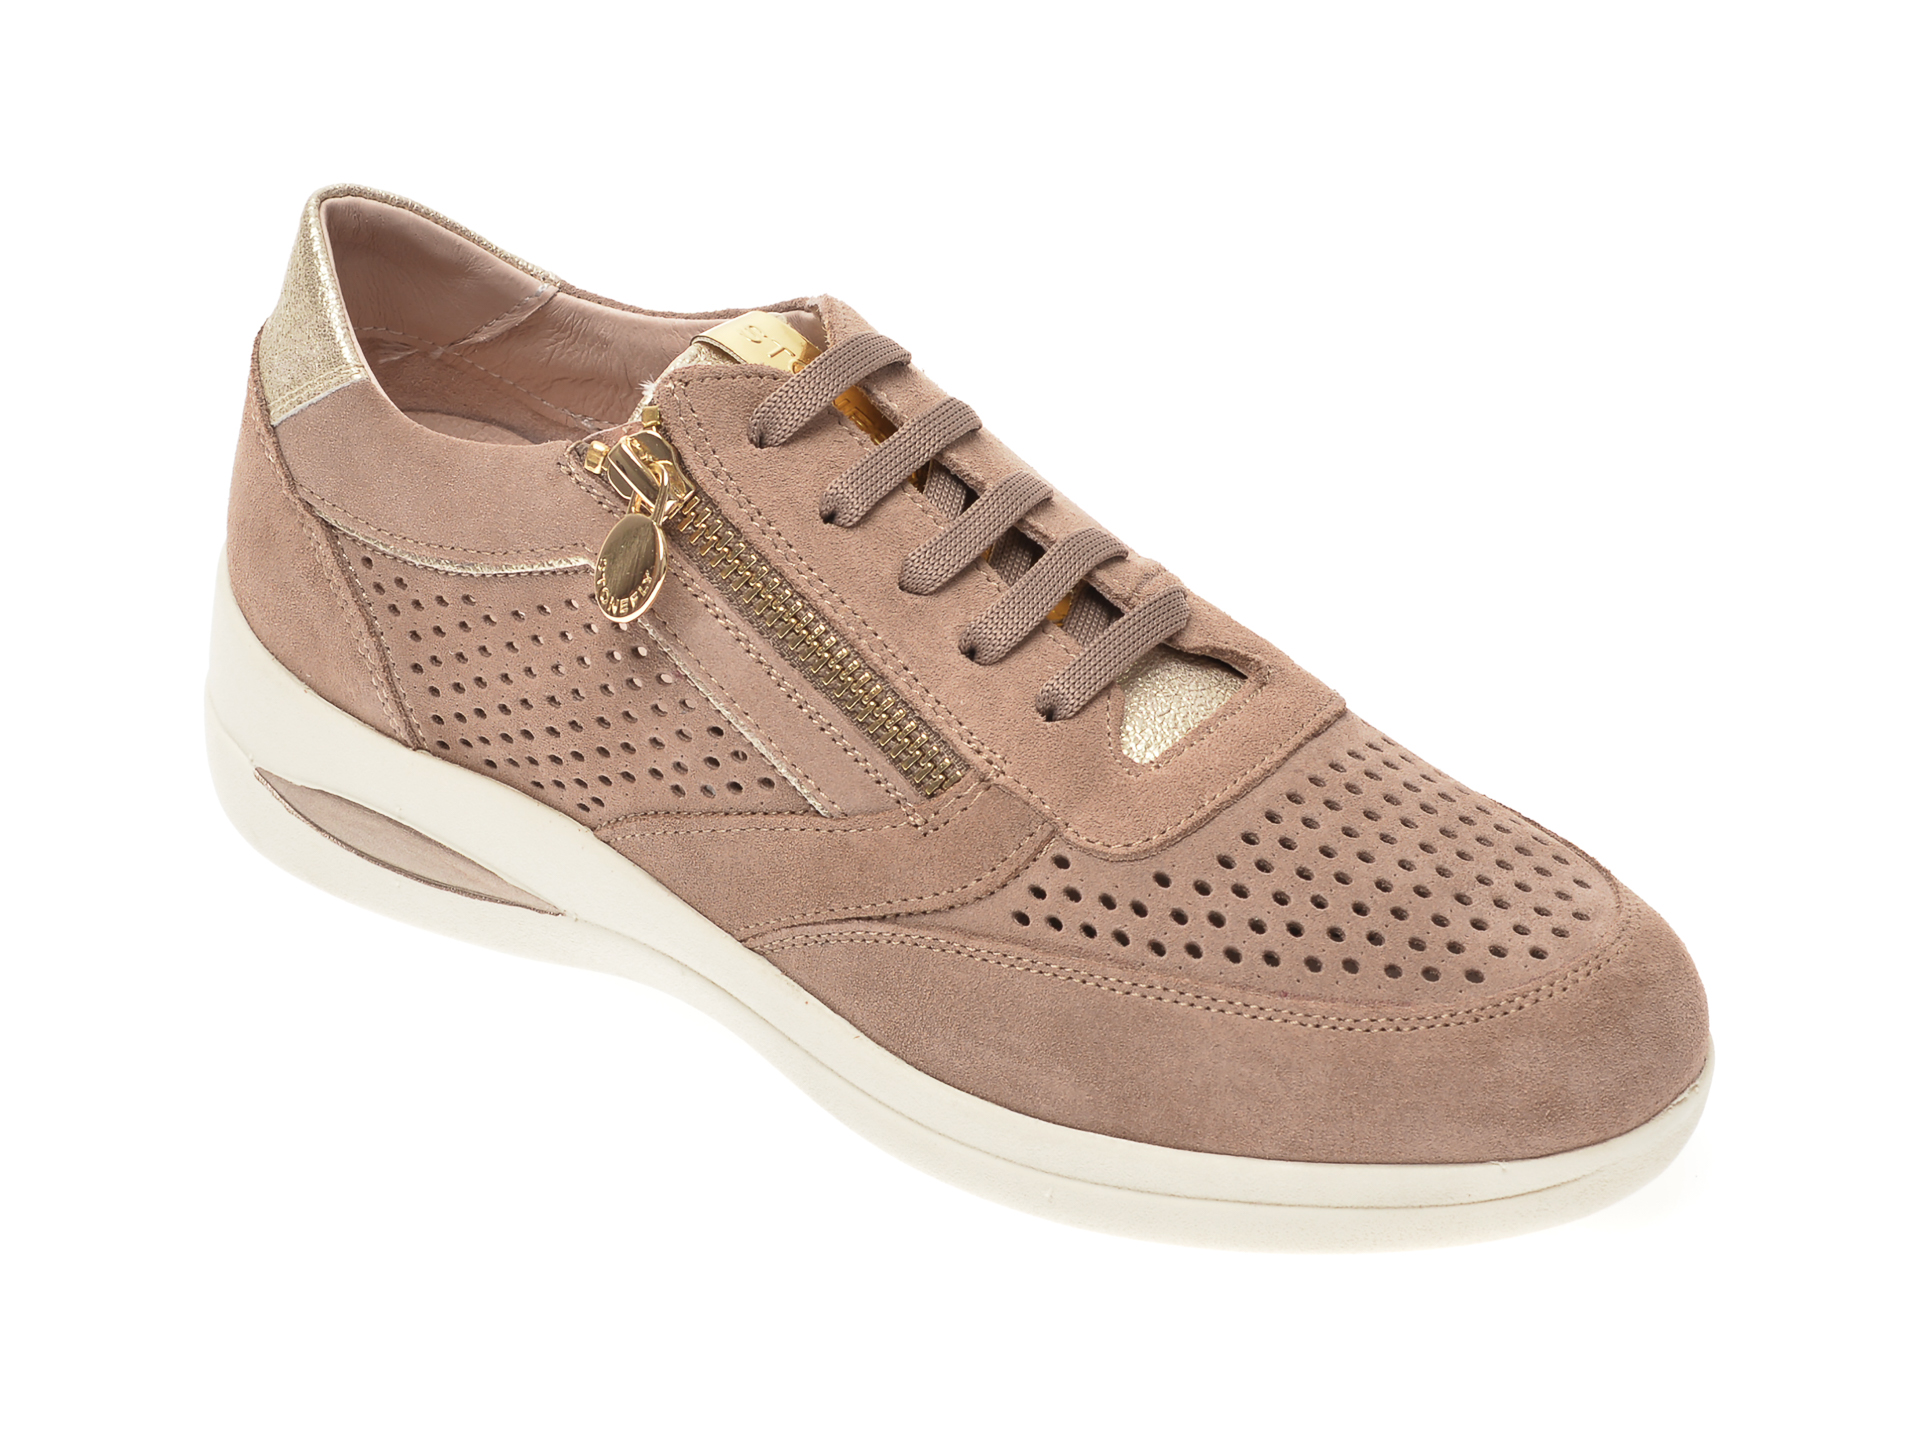 Pantofi STONEFLY maro, AURORA5, din piele intoarsa imagine